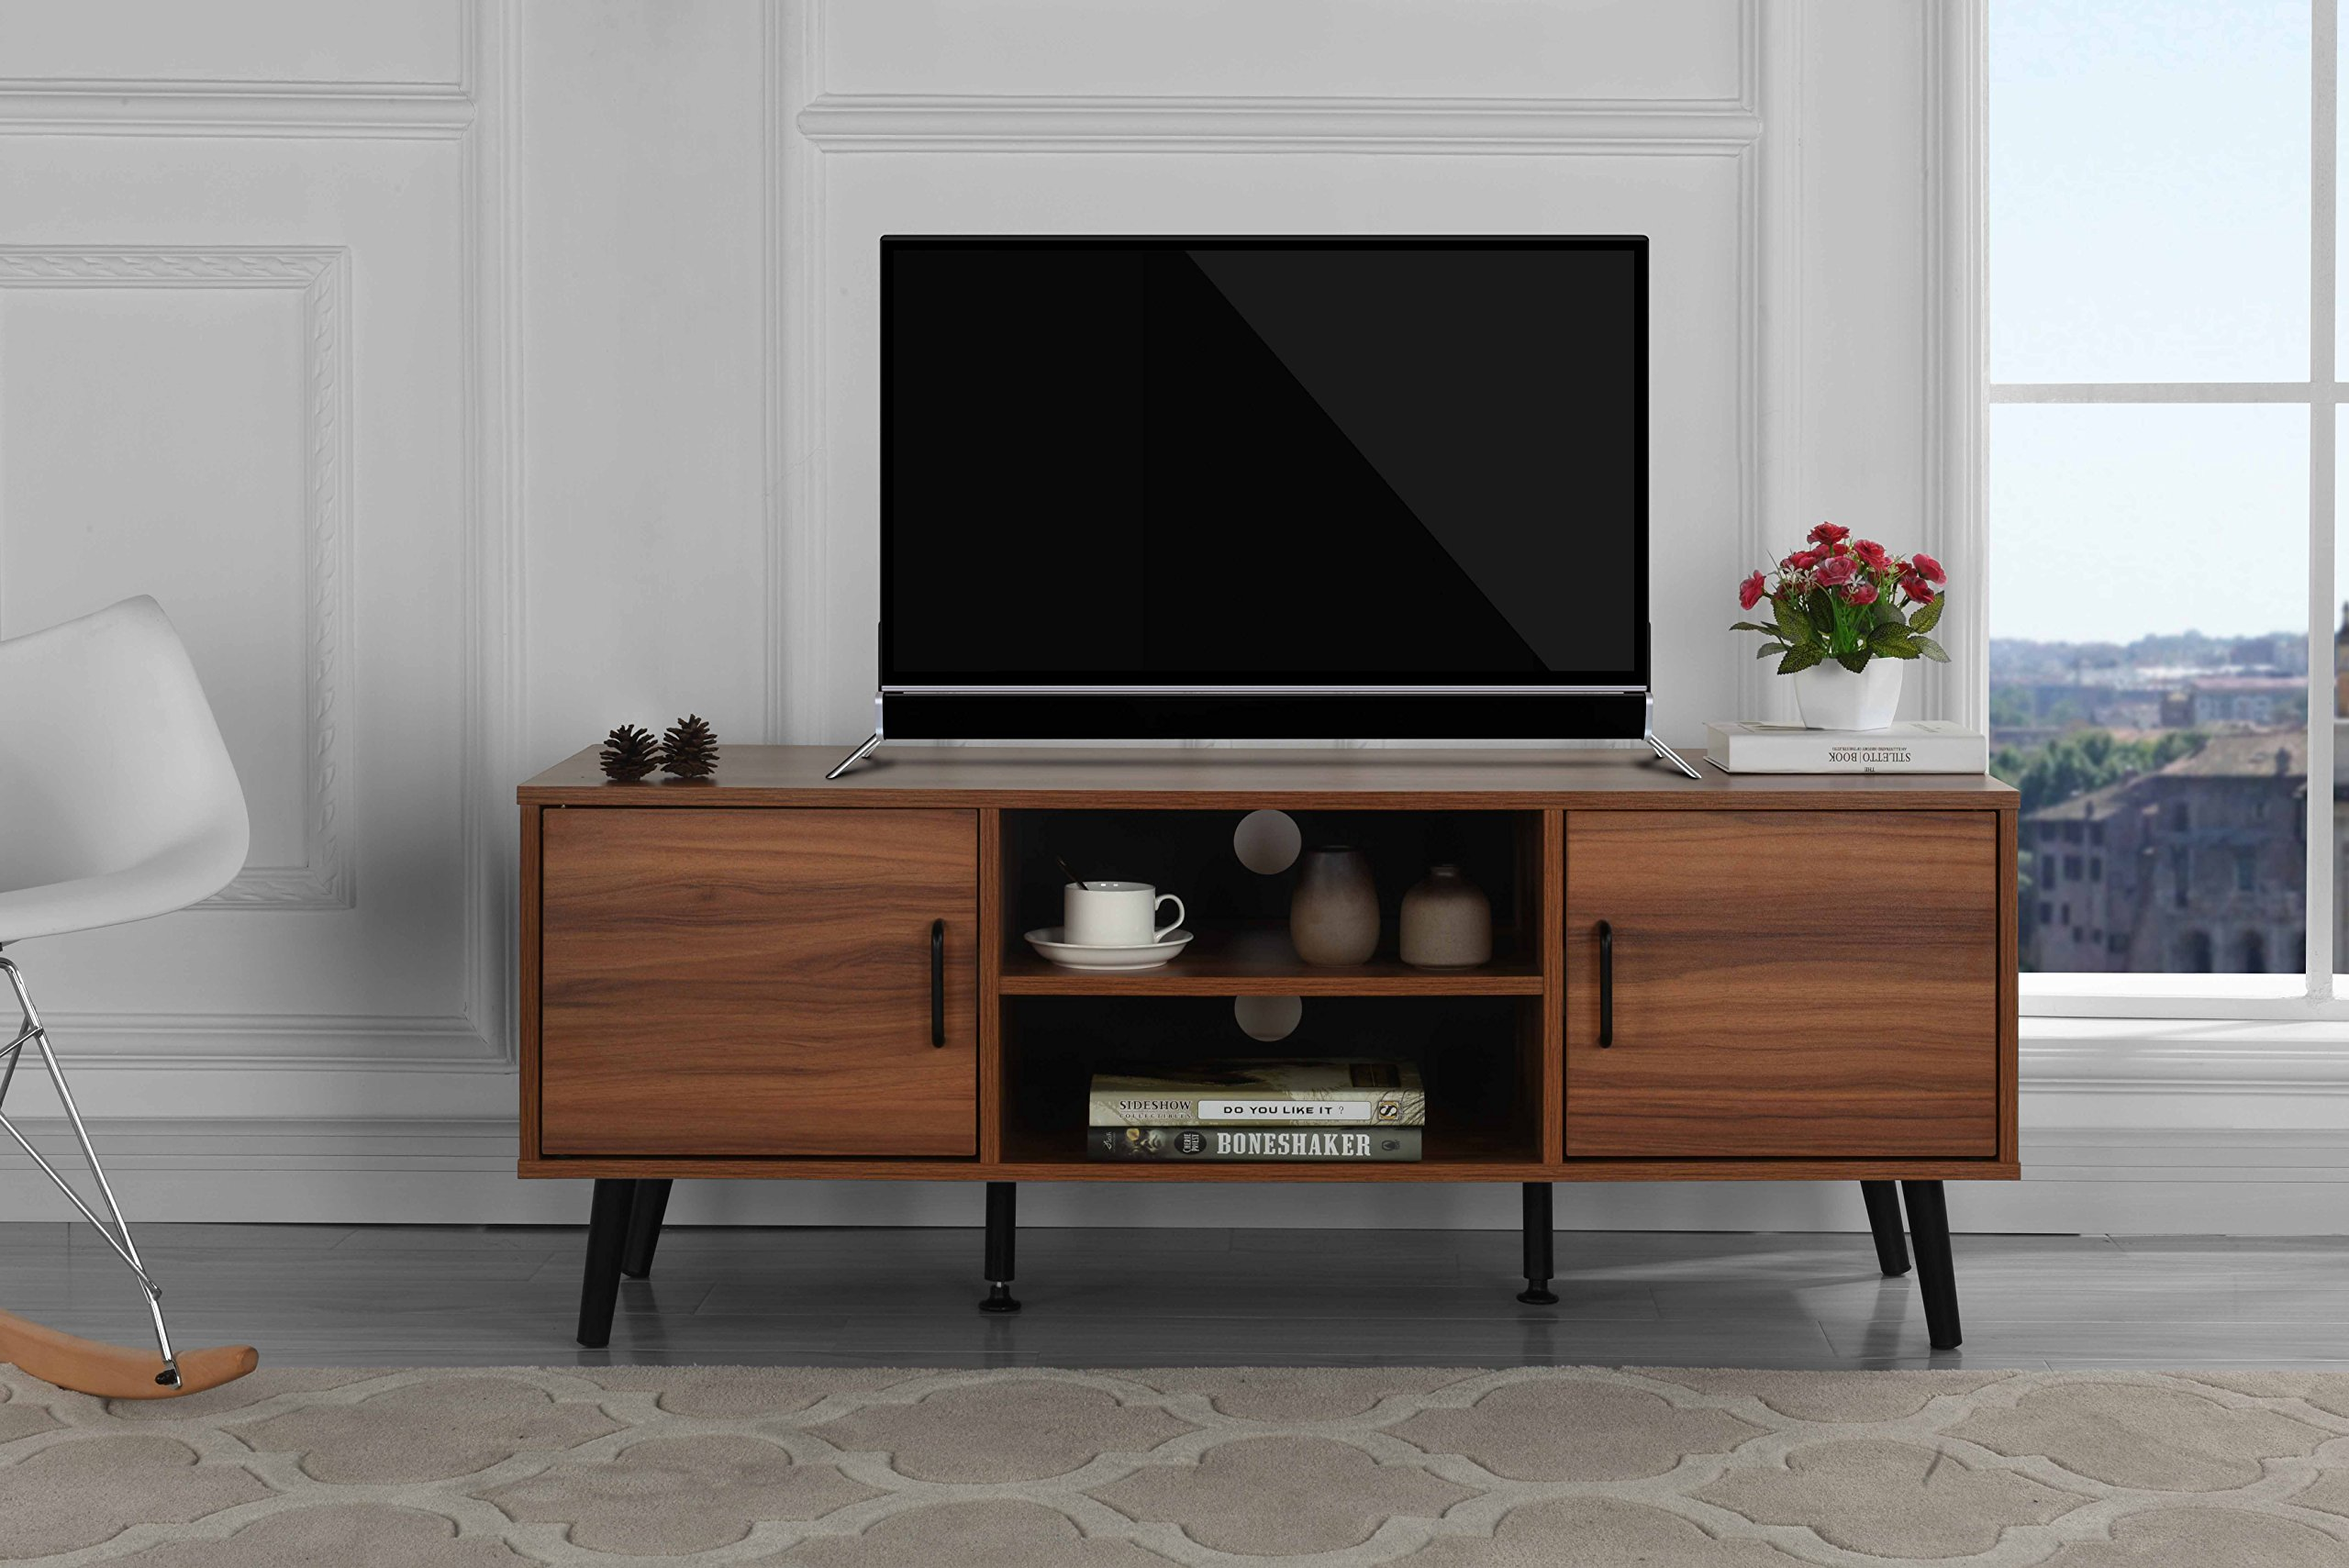 Divano Roma Furniture Mid Century Modern TV Stand (Dark Brown) by DIVANO ROMA FURNITURE